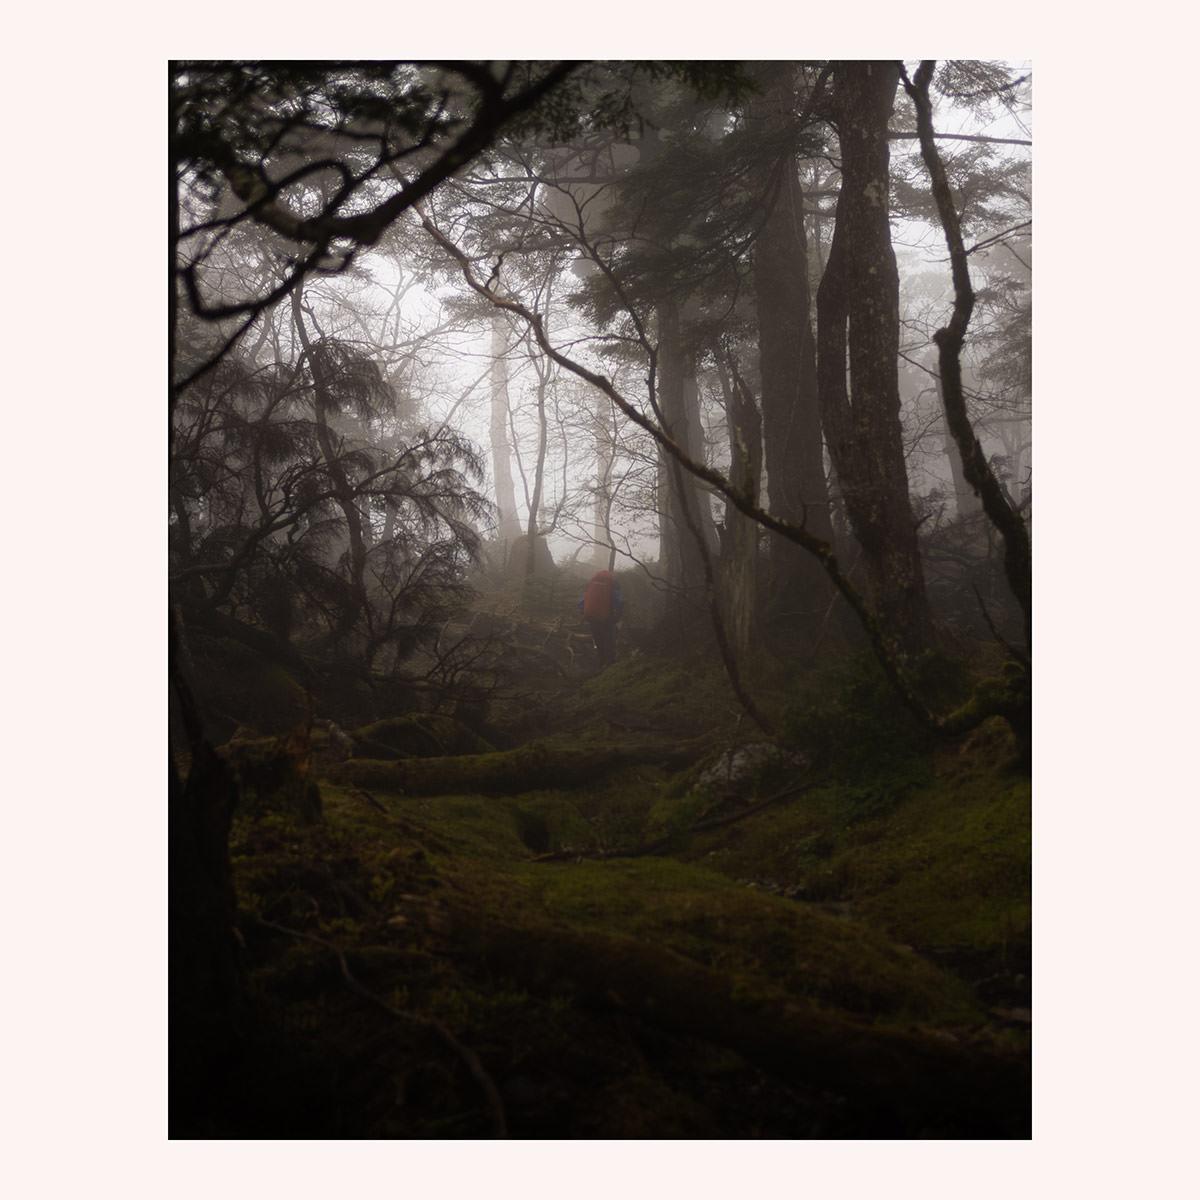 Mist, moss, morning